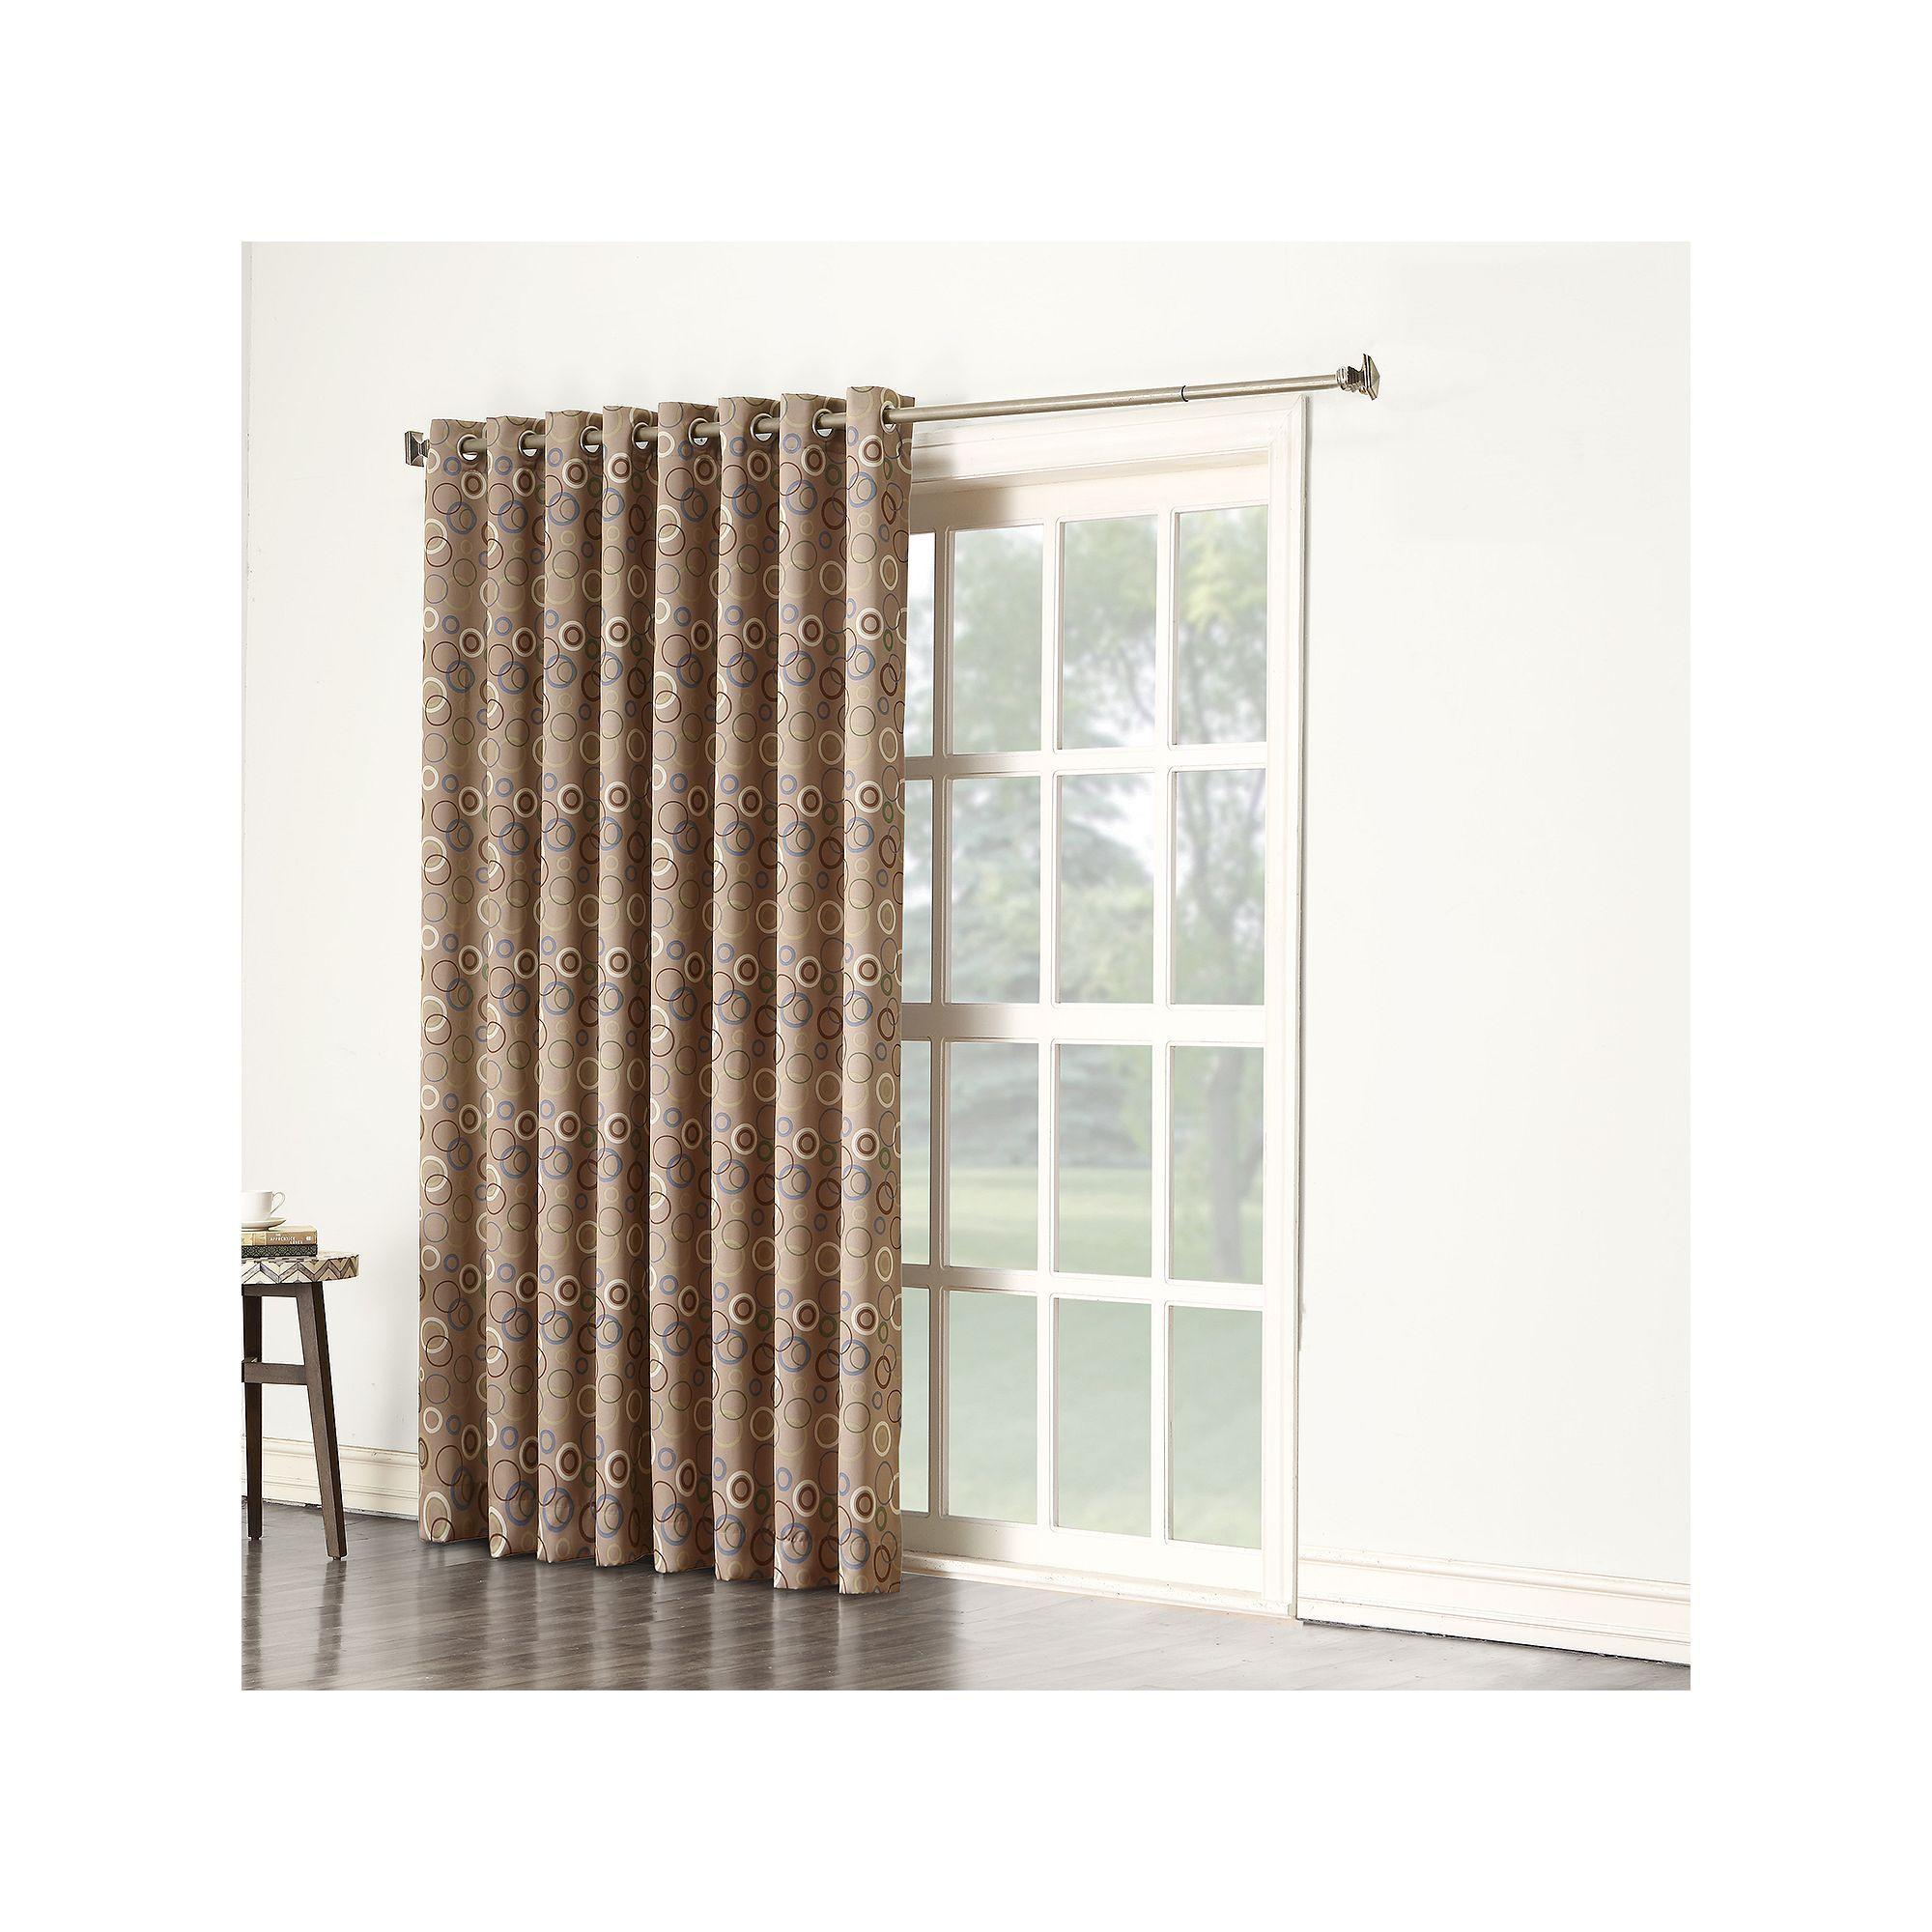 Sun Zero Galaxy Room Darkening Patio Door Curtain 100 x 84